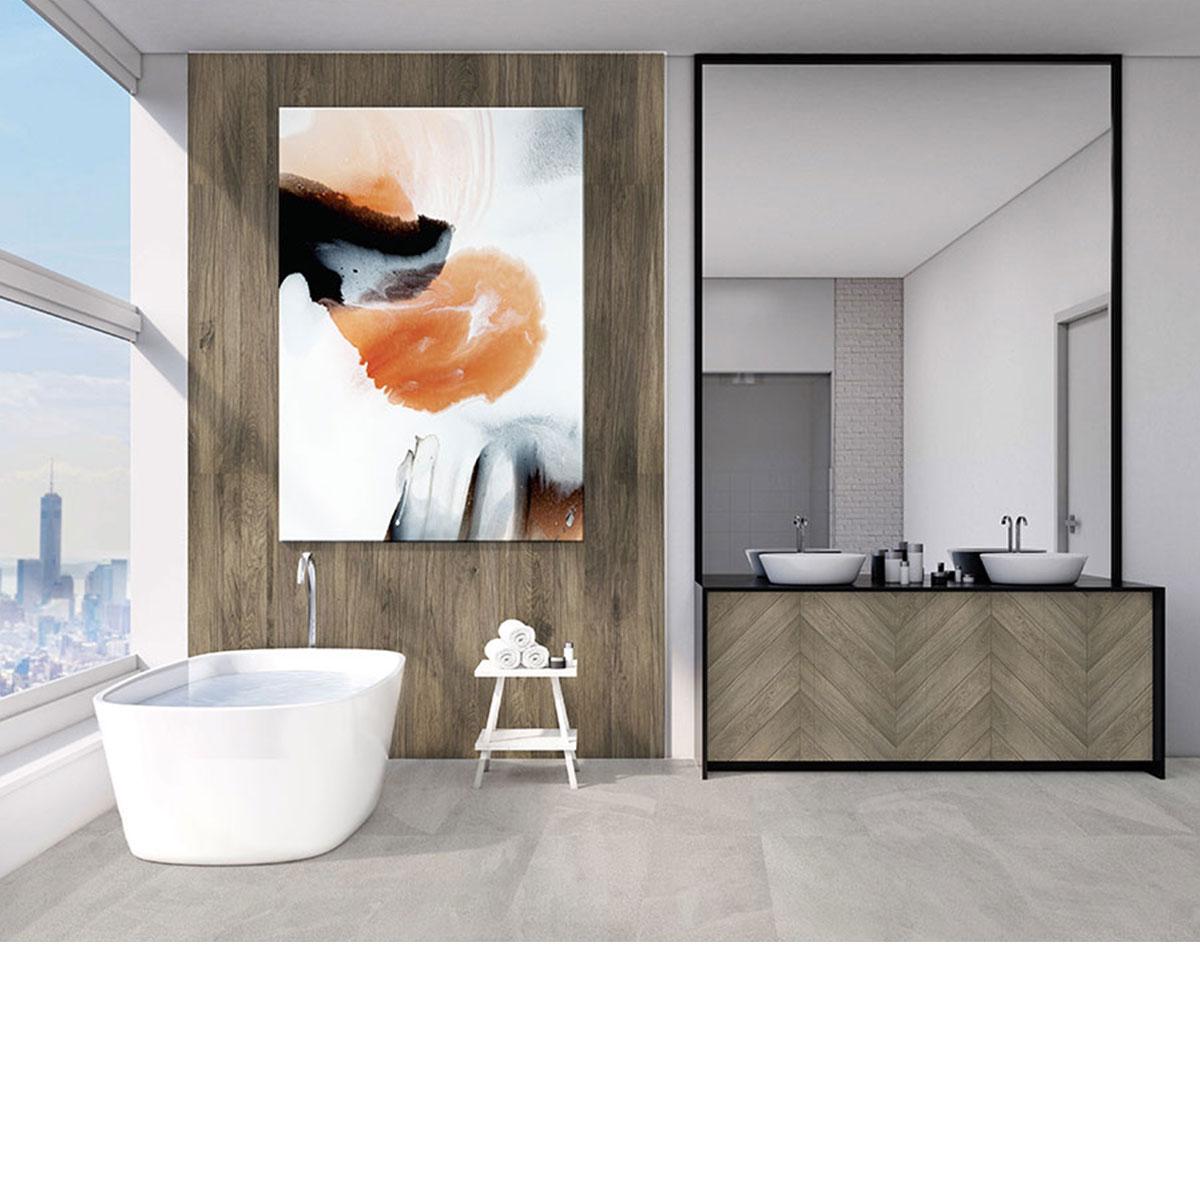 Timberland - Dark Oak - Timber Look Tiles - Stone3 Brisbane